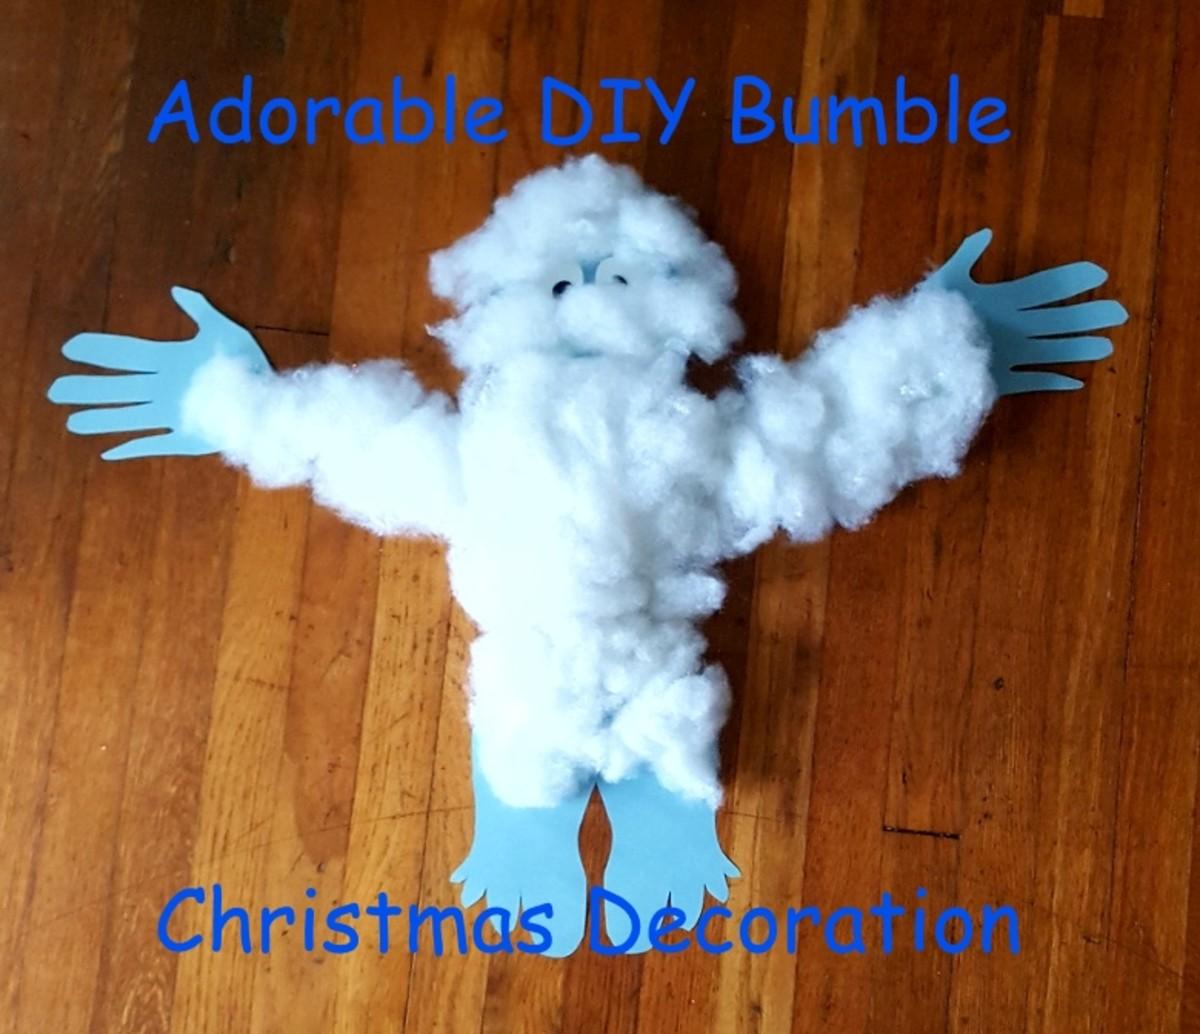 Adorable DIY Bumble Christmas Decoration